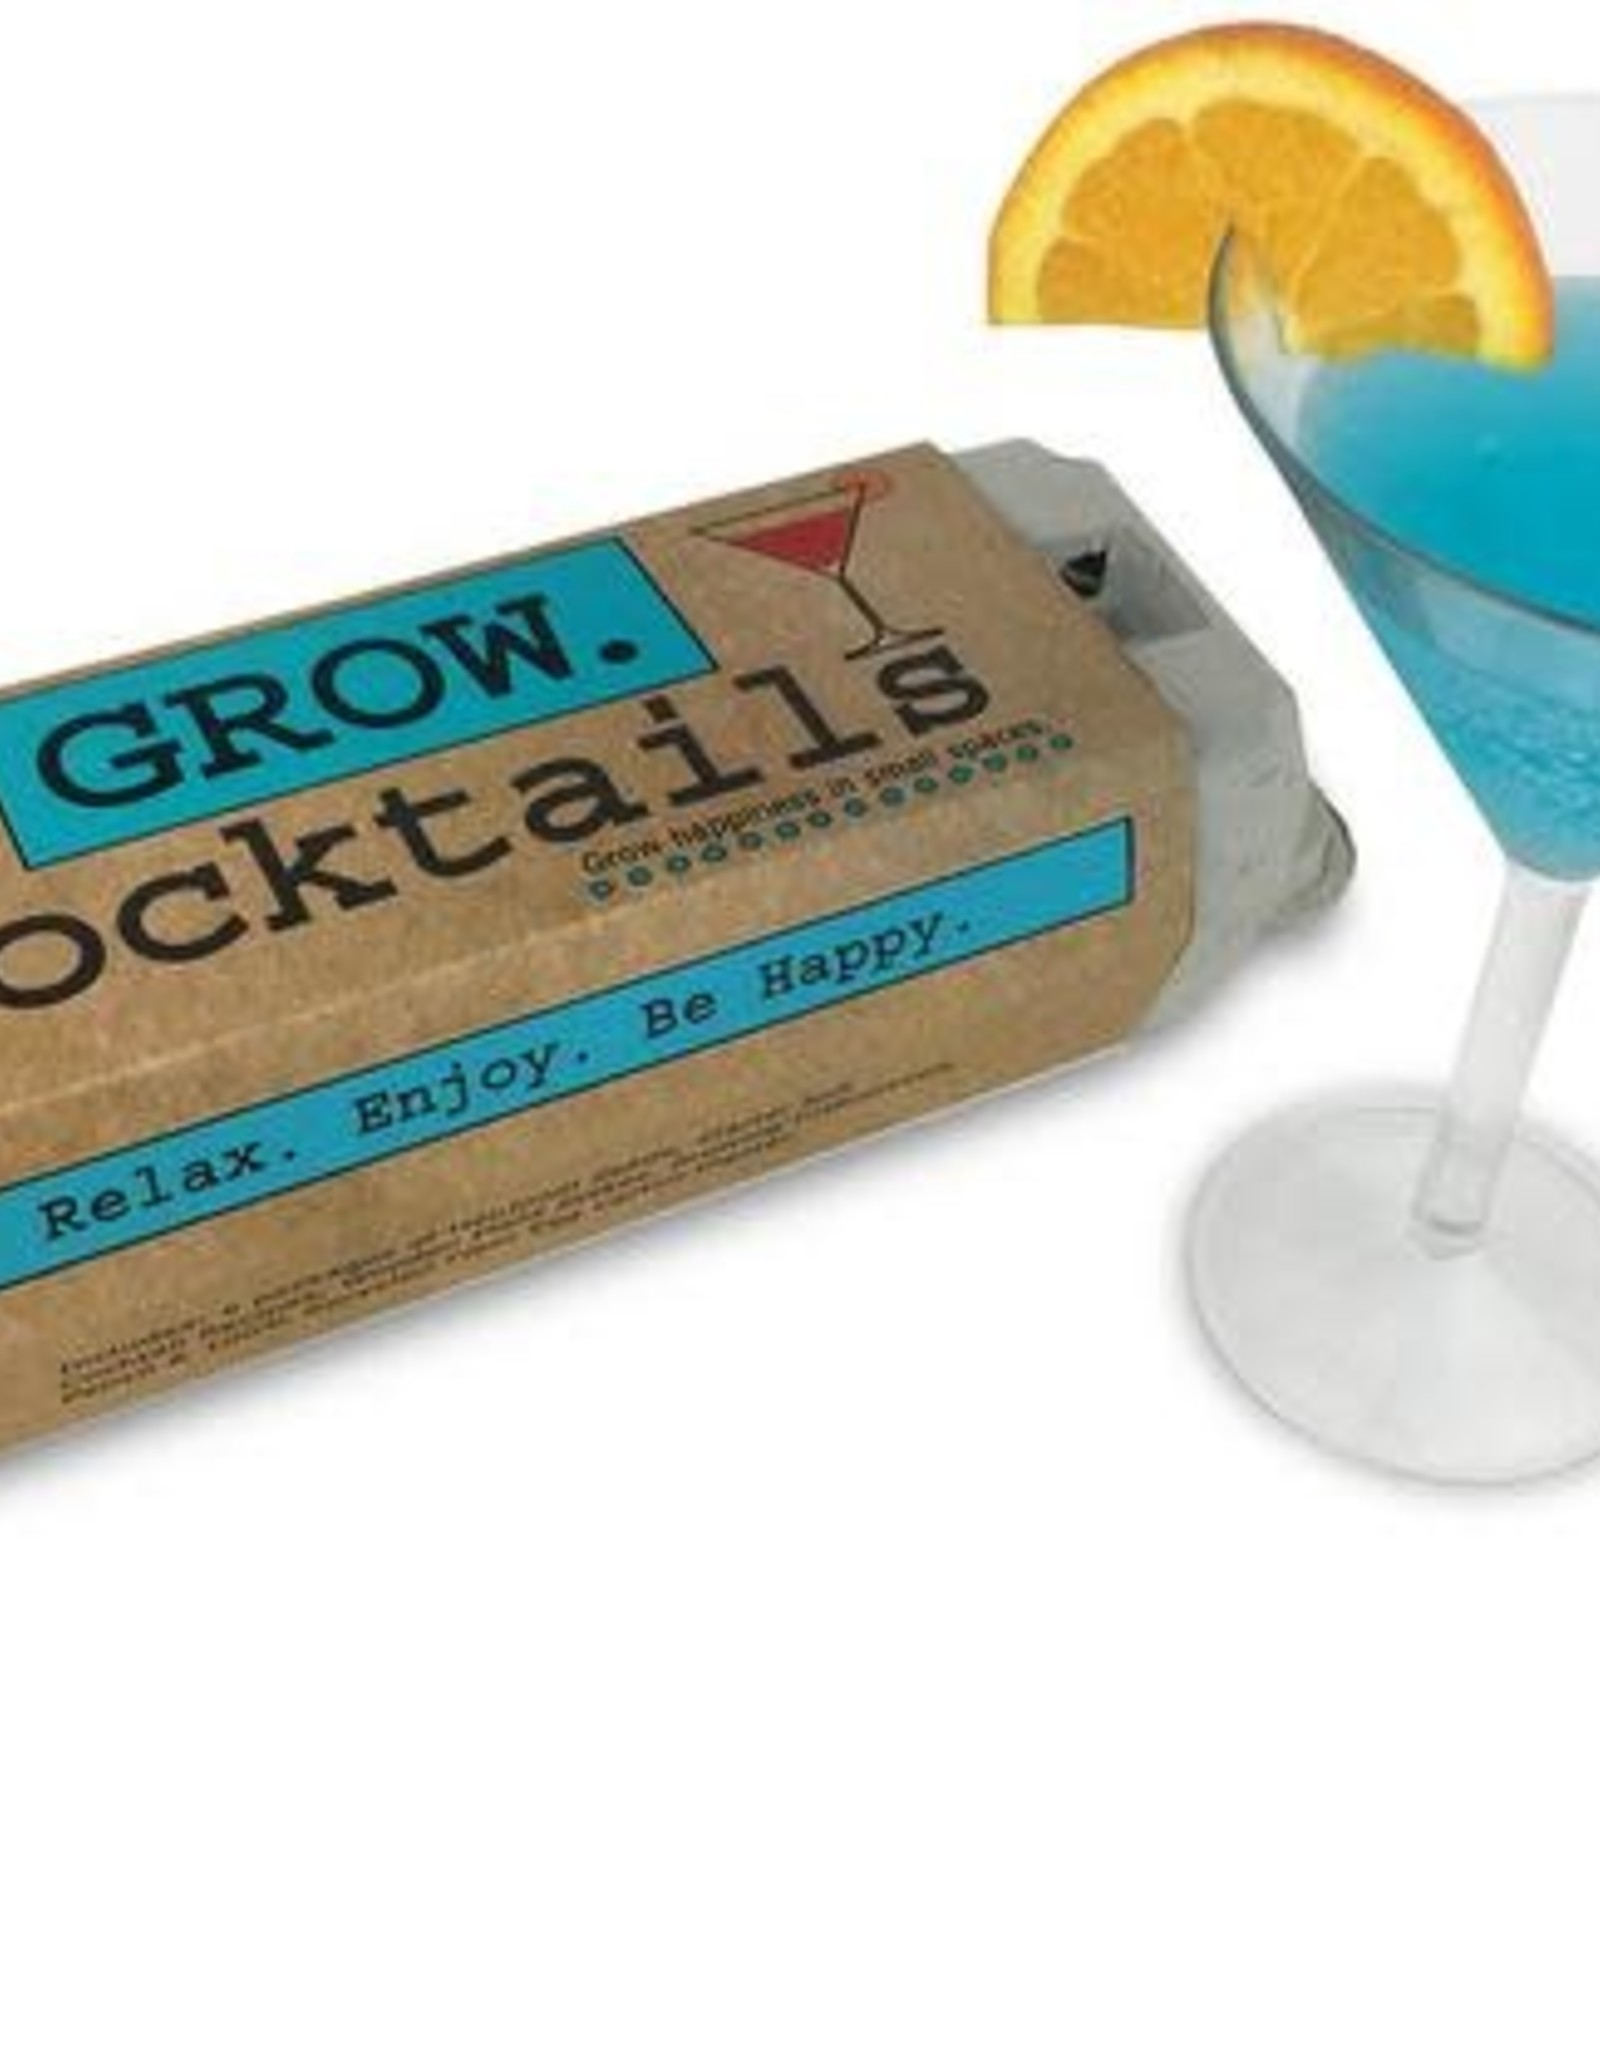 Backyard Safari Co Grow Cocktails